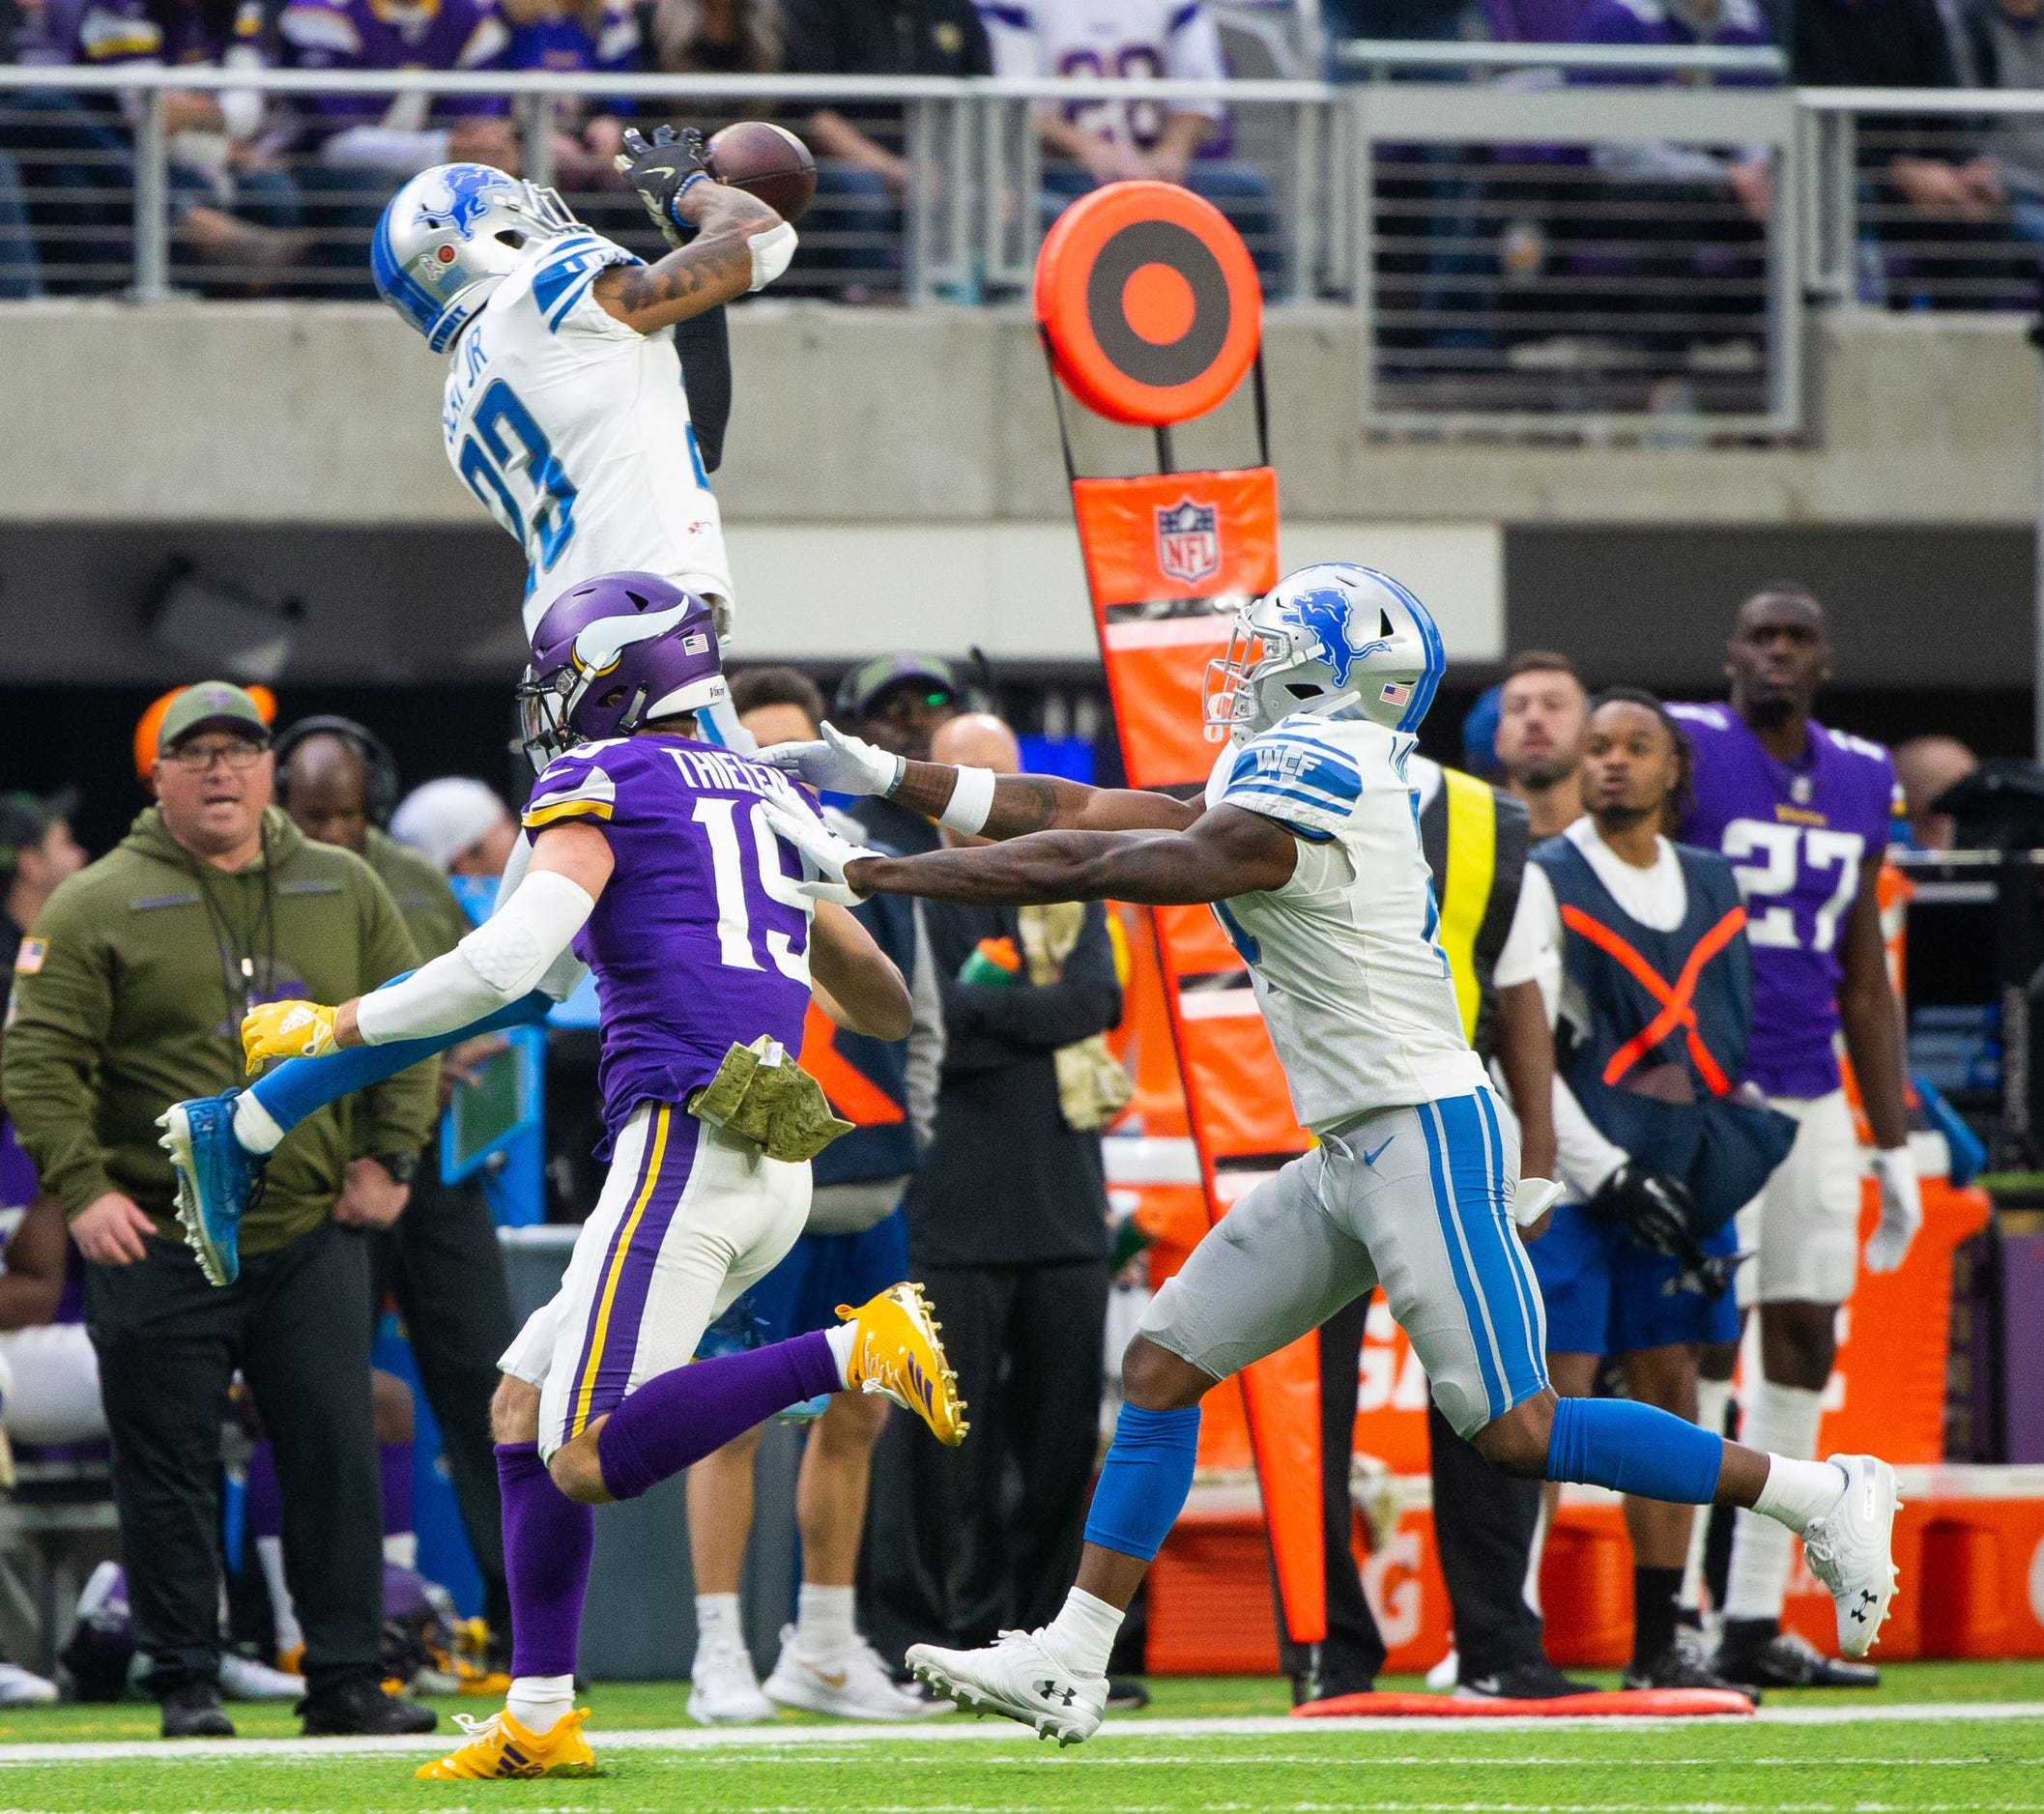 Lions defensive back Darius Slay intercepts Vikings quarterback Kirk Cousins in the second quarter Sunday, Nov. 4, 2018, in Minneapolis.